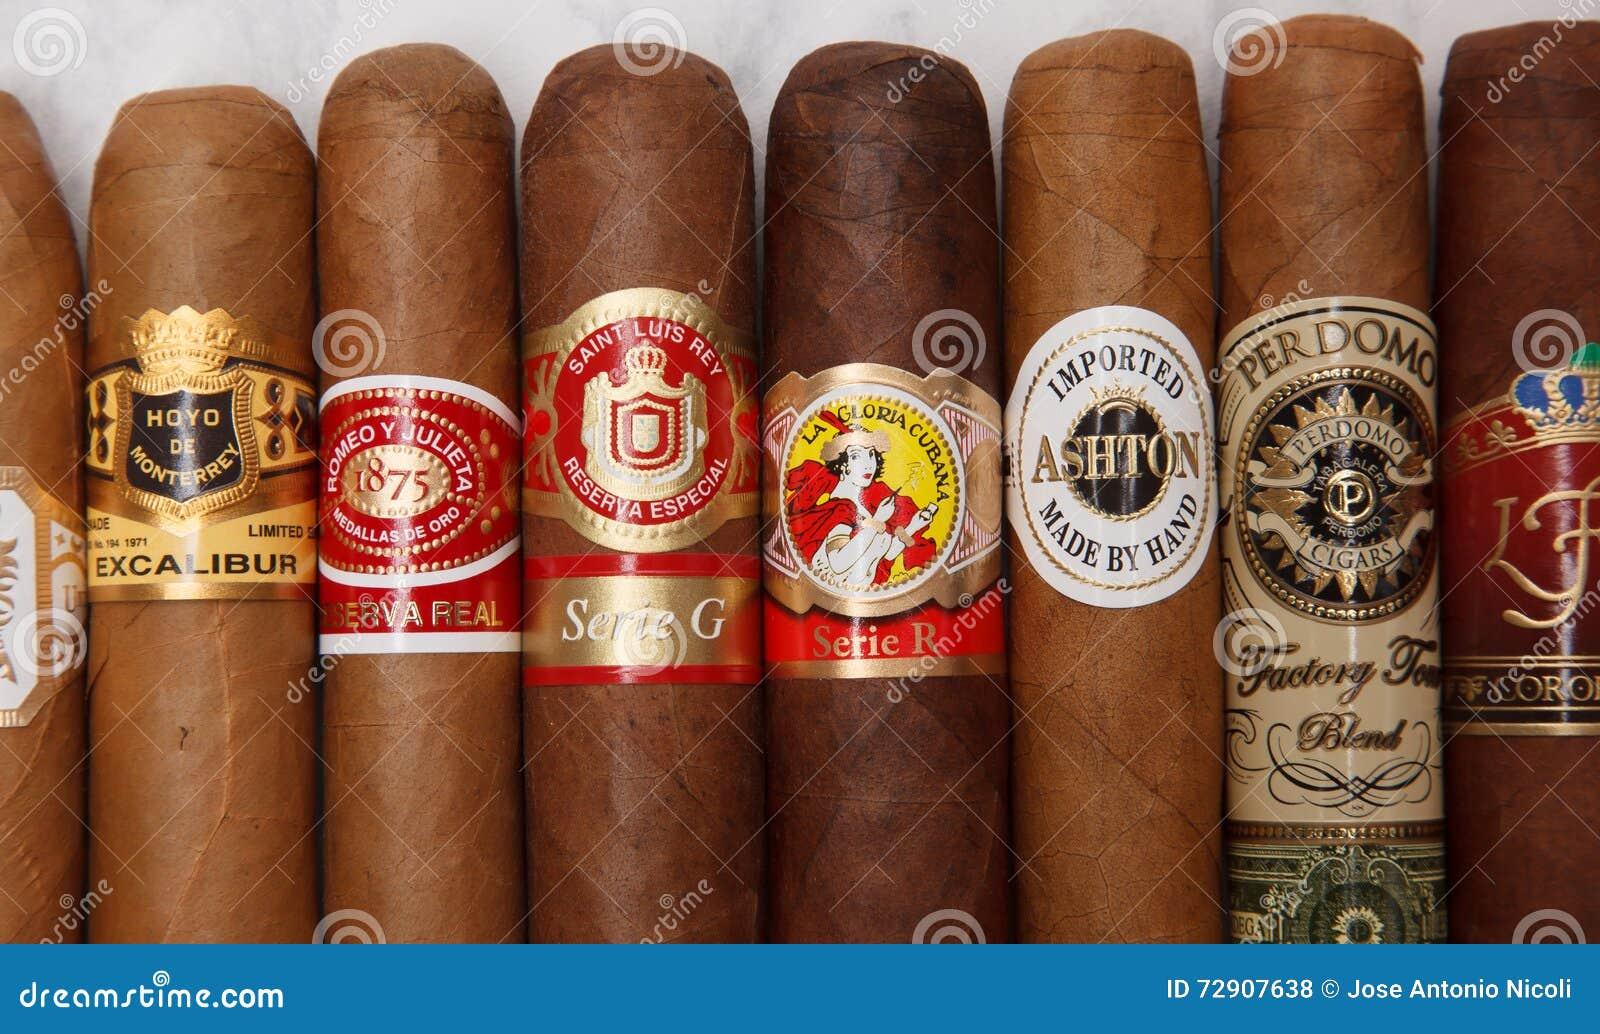 Same Name: World Cigars Editorial Stock Photo